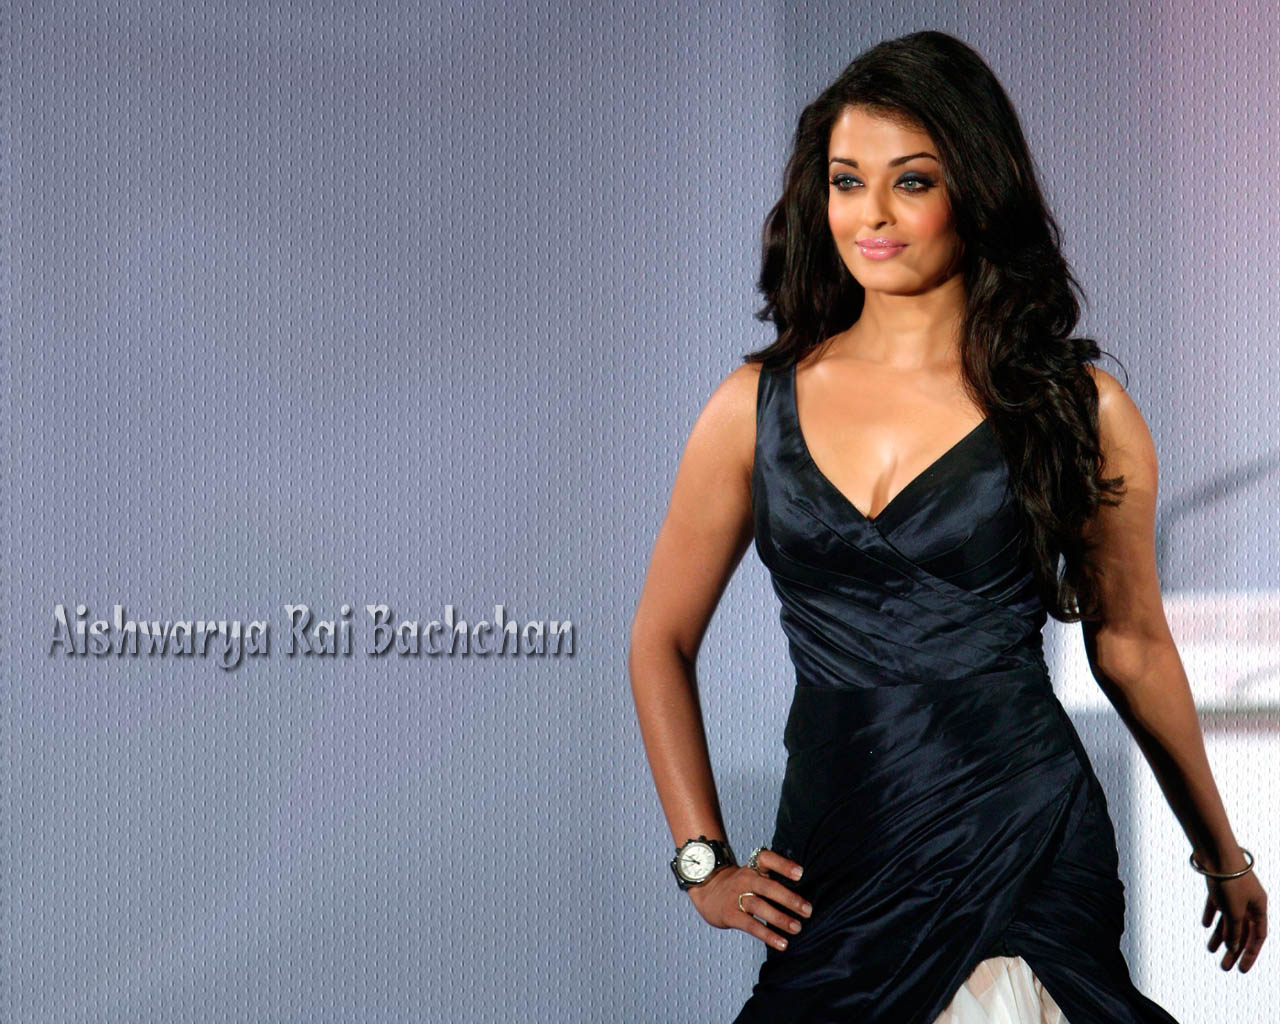 http://2.bp.blogspot.com/-_2PzbtgLONM/TVY5qFnjo_I/AAAAAAAAAH8/CtImew9soRA/s1600/aishwarya-rai-pics.jpg